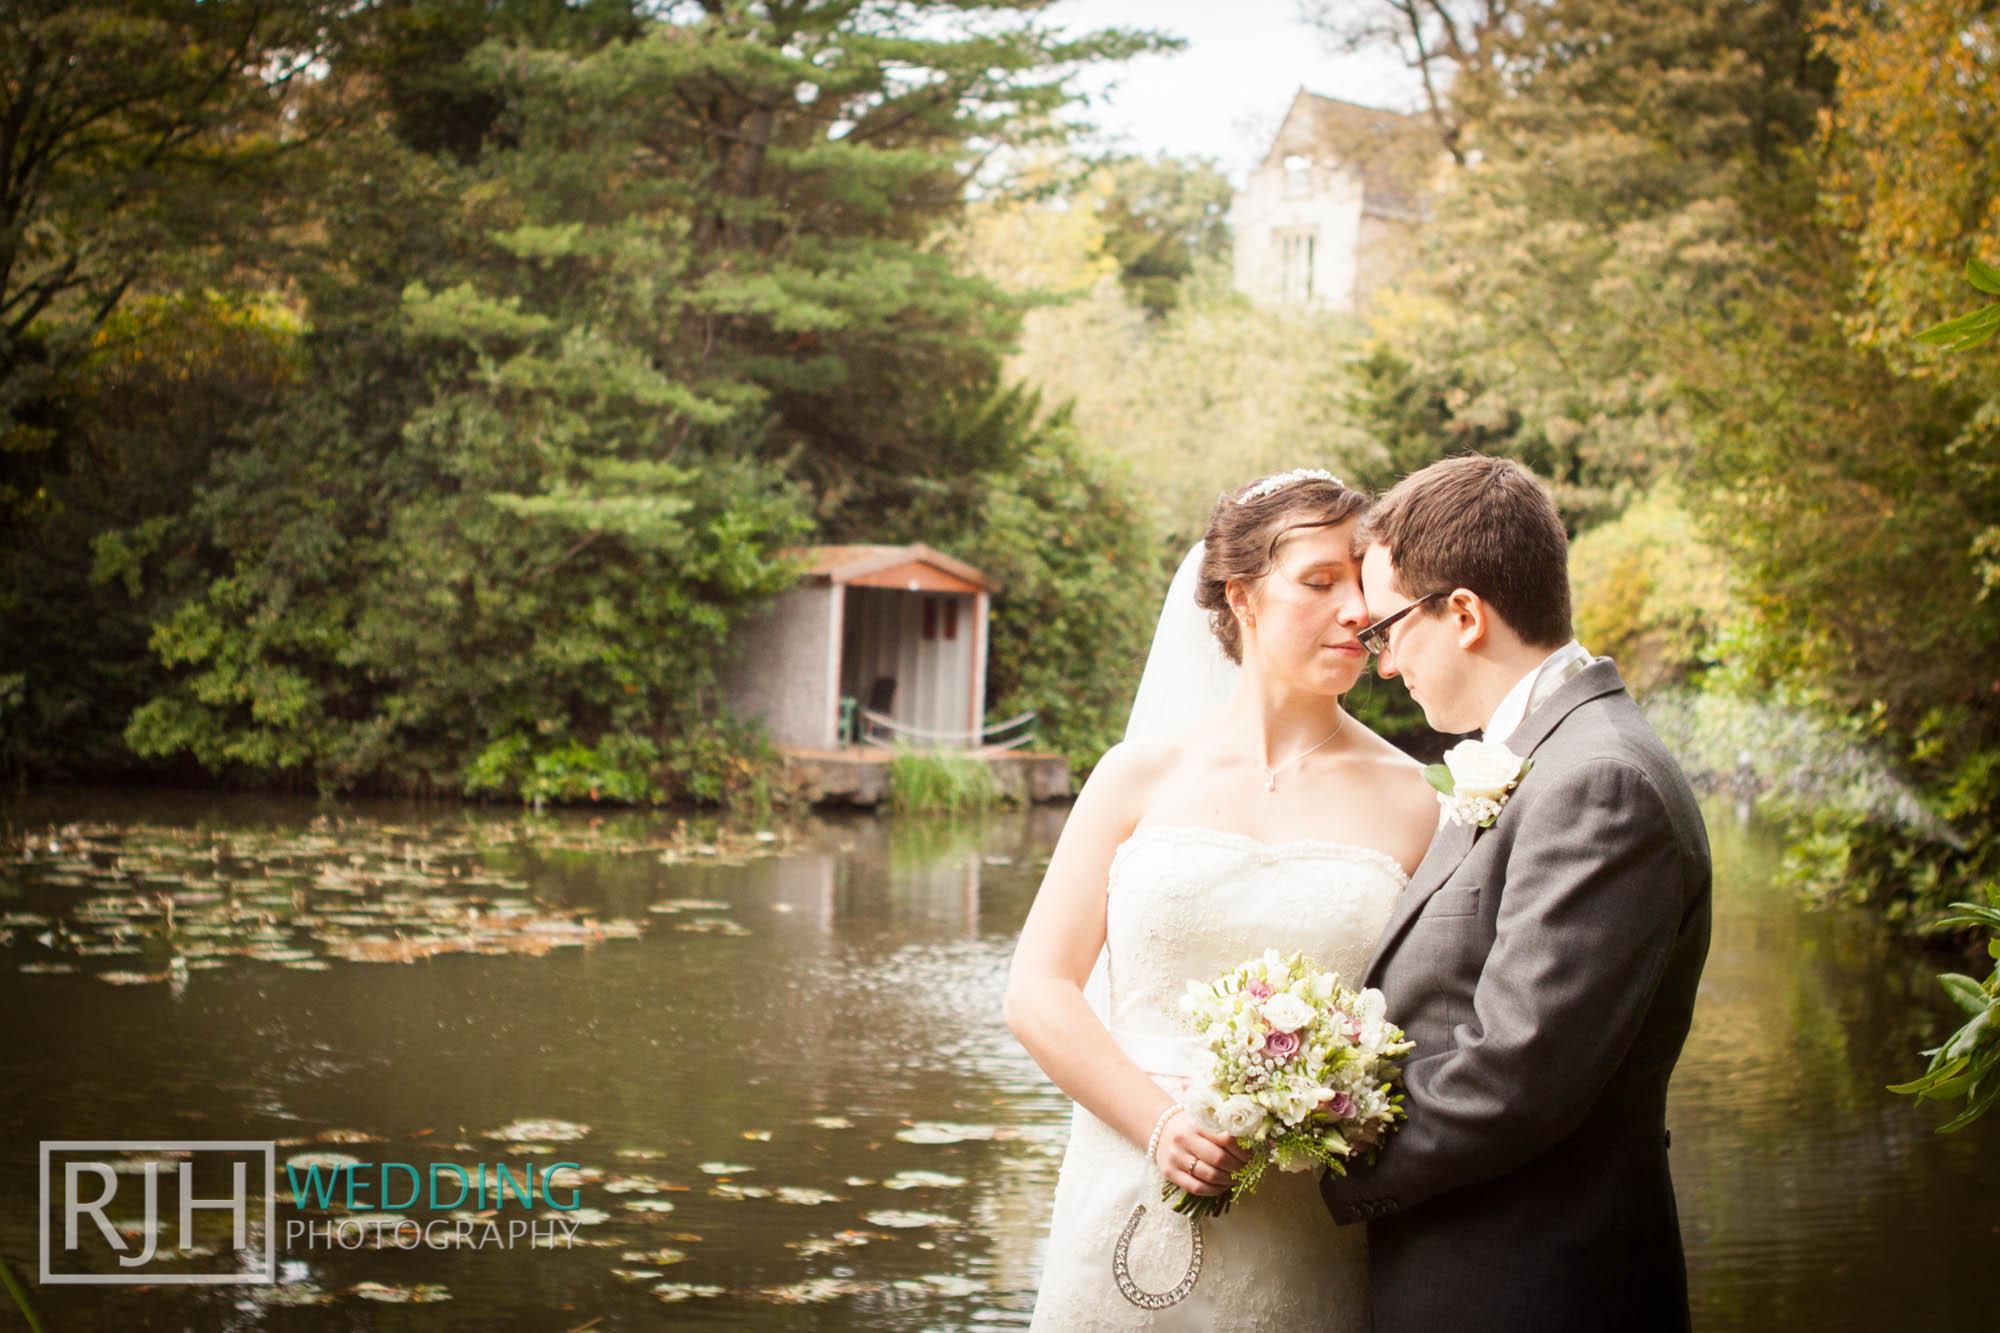 RJH Wedding Photography_2014 highlights_51.jpg